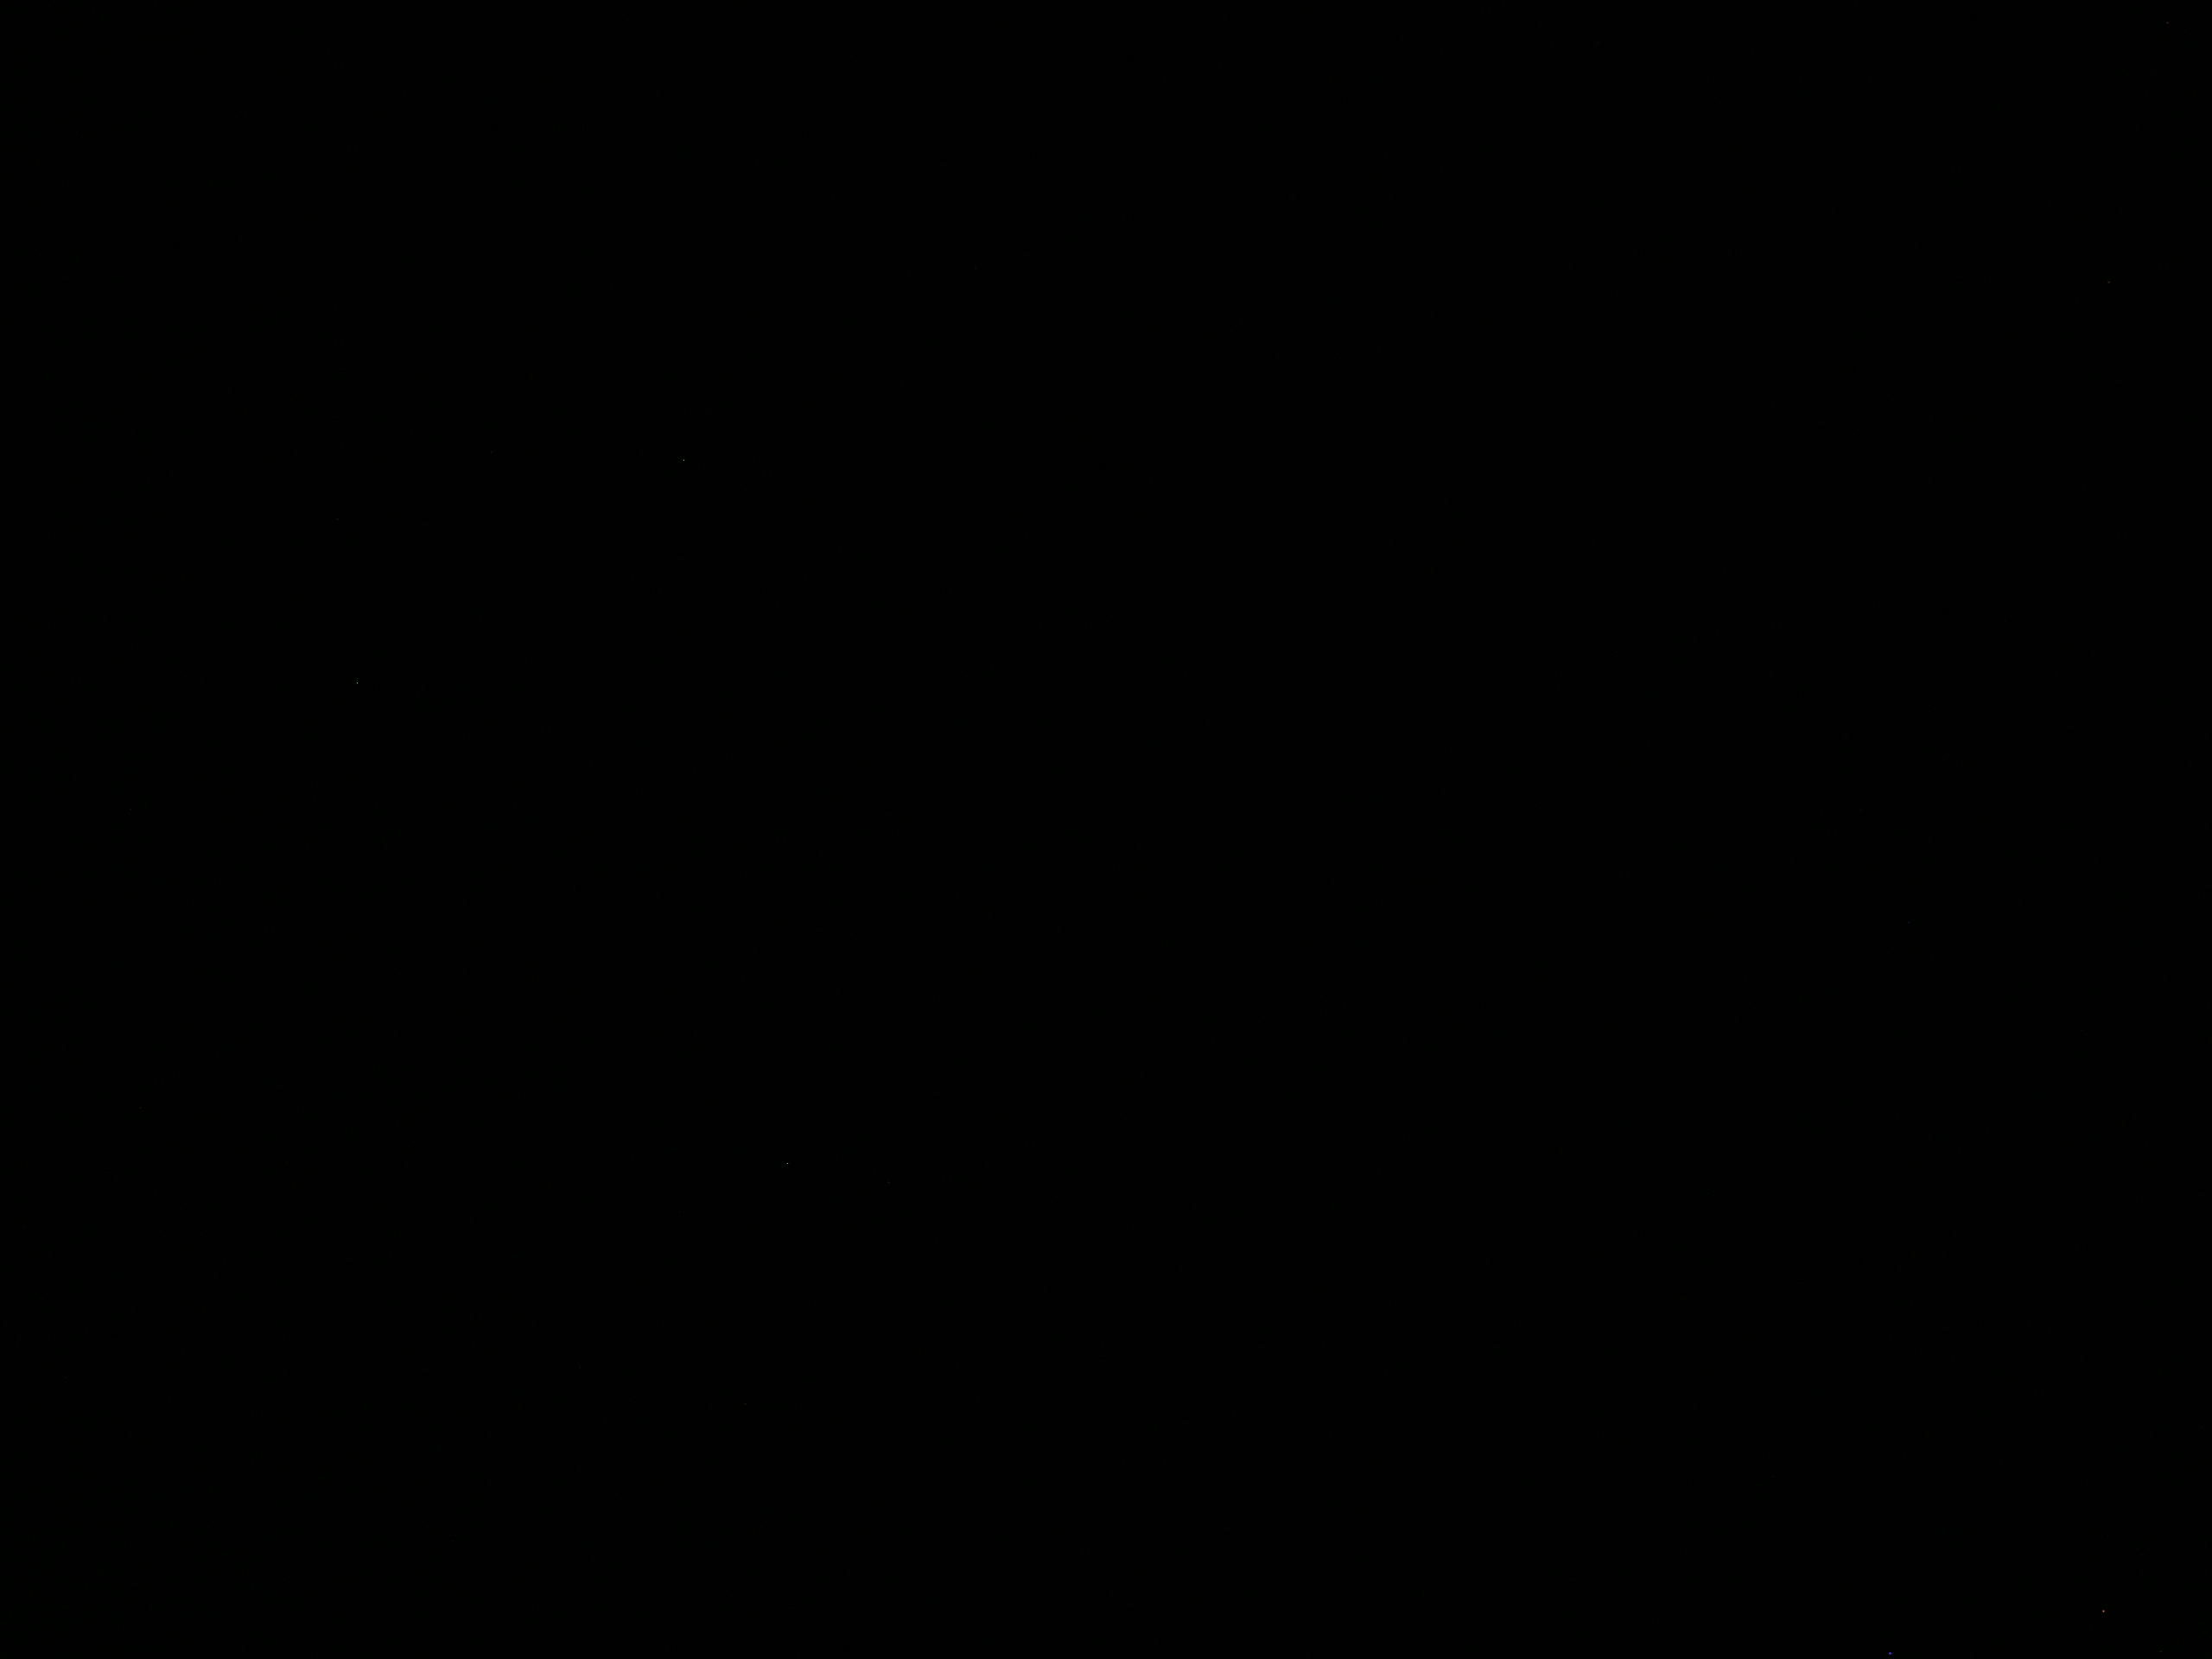 A1 불량화소 체크